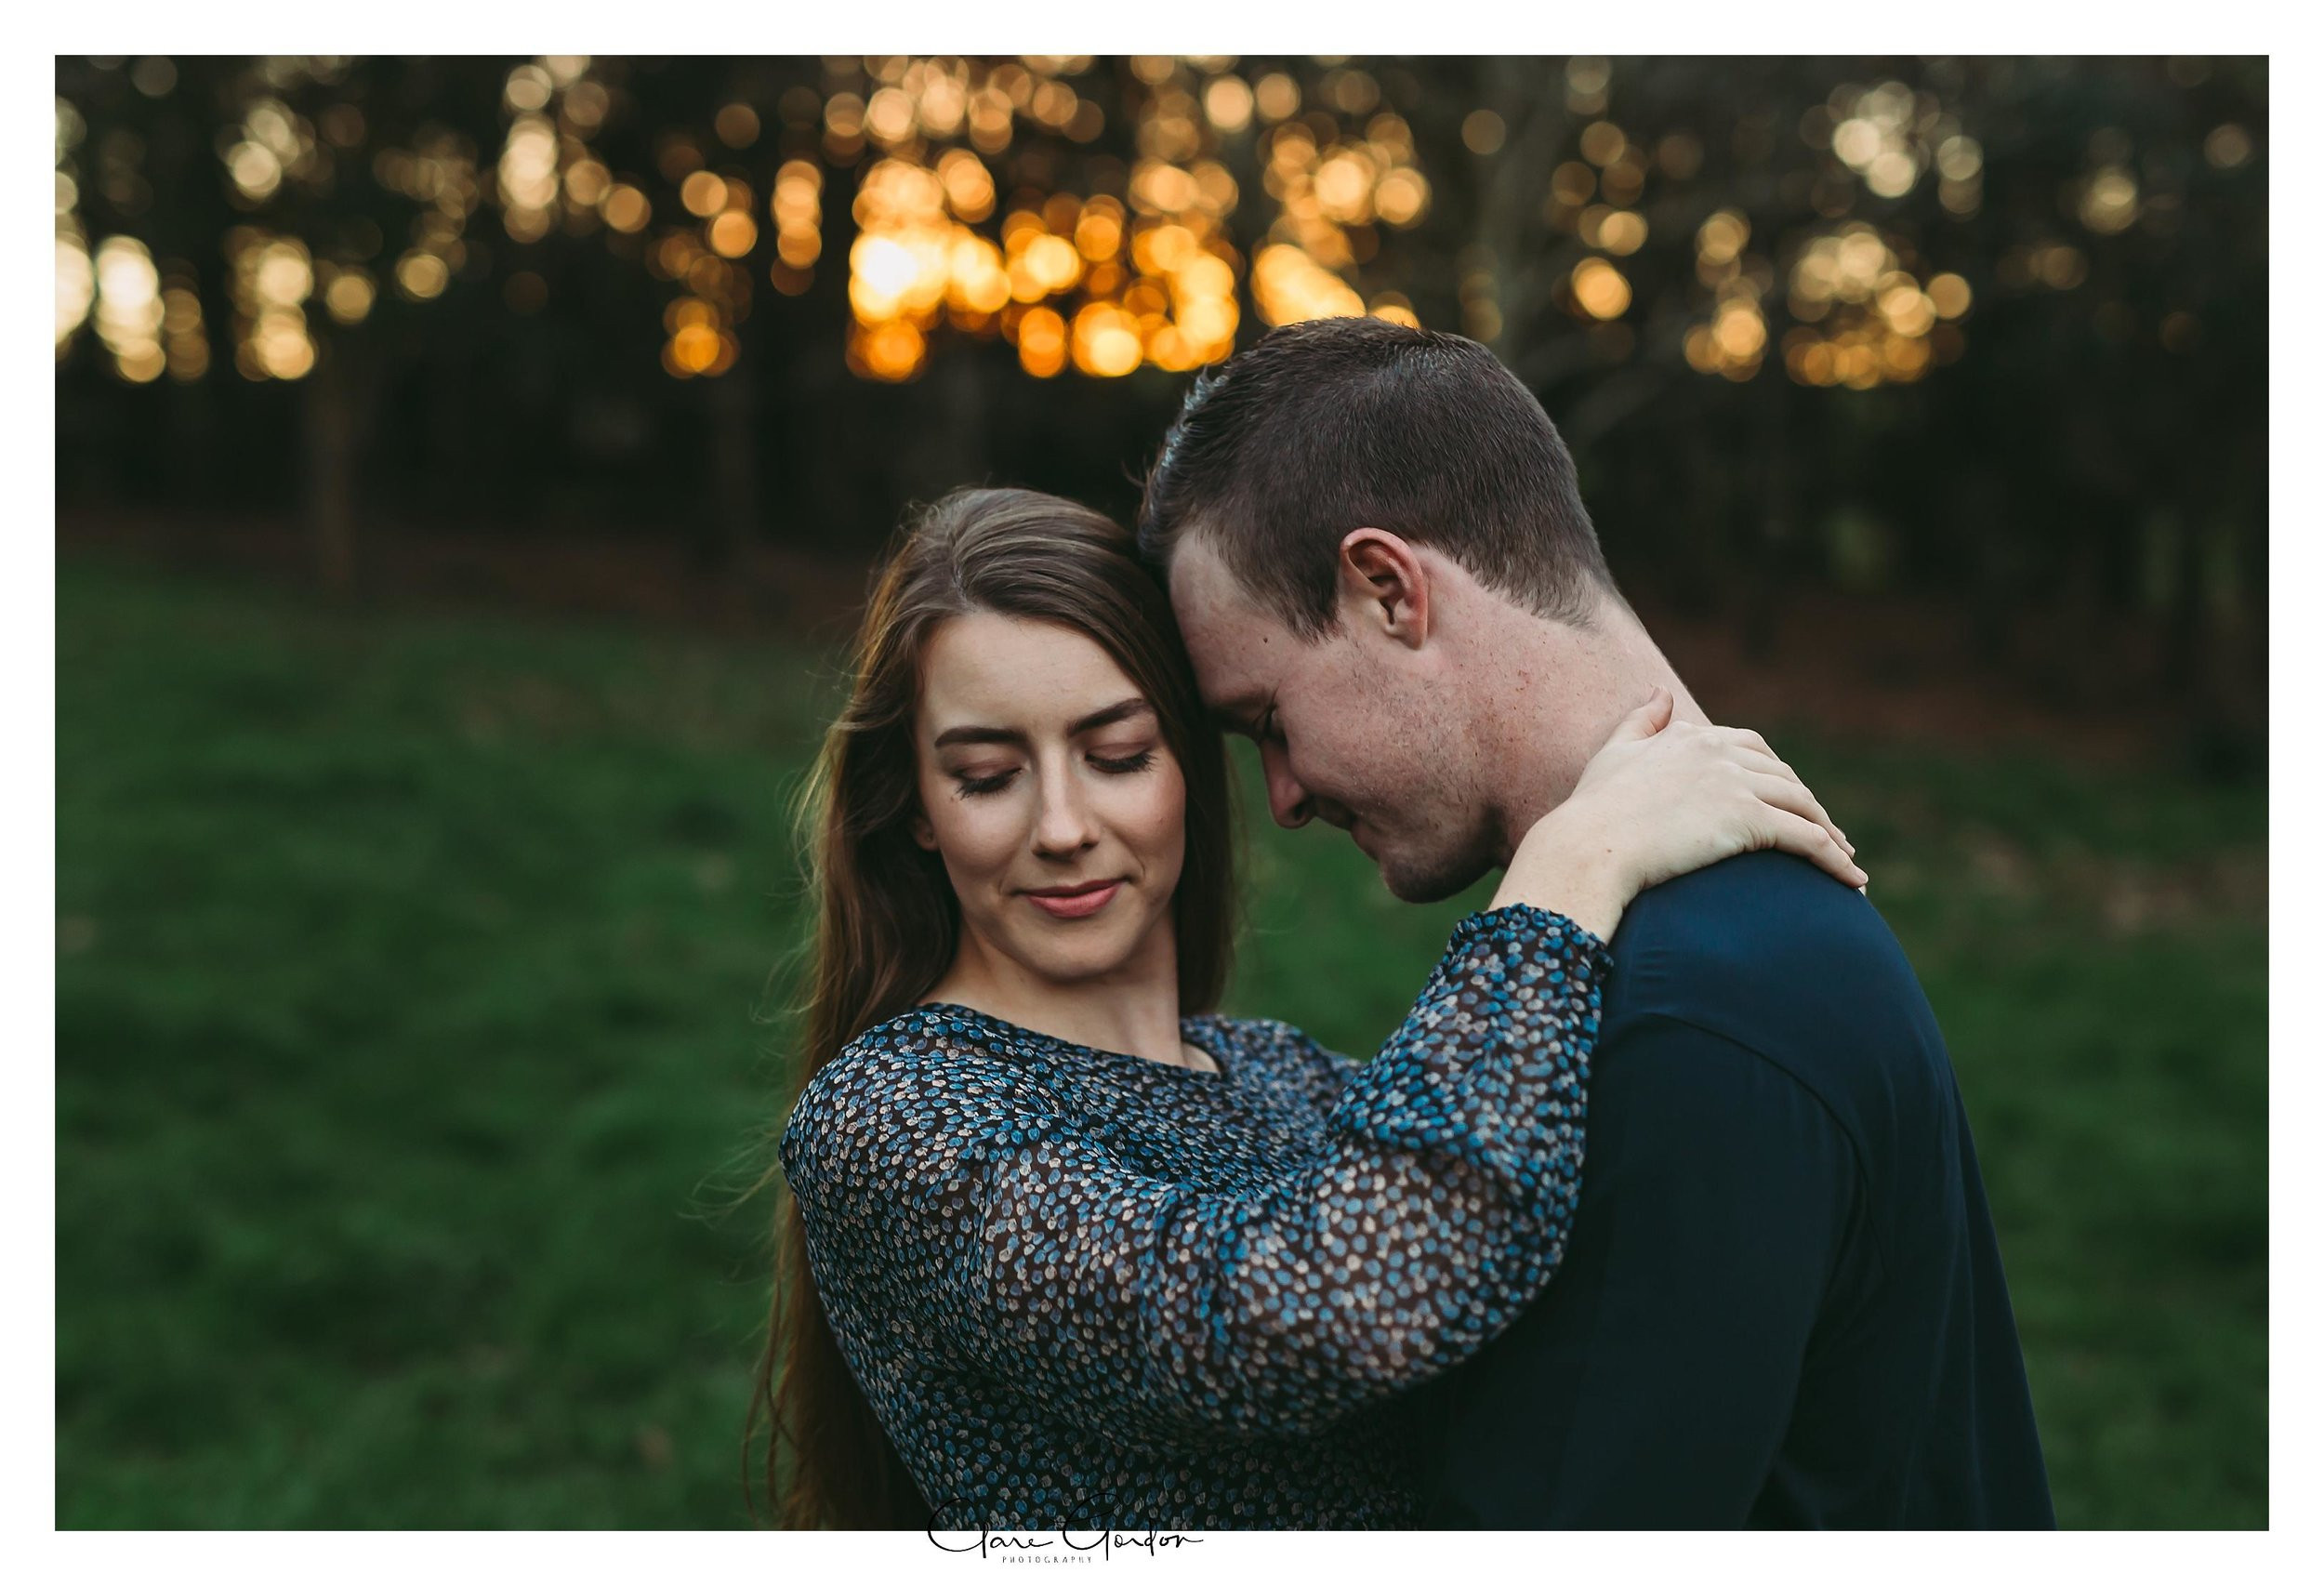 Shaun-Celine-taitua-arboretum-engagement-photos-newzealand-wedding-photographer-waikato-wedding-photographer-waikato-wedding-photography (19).jpg